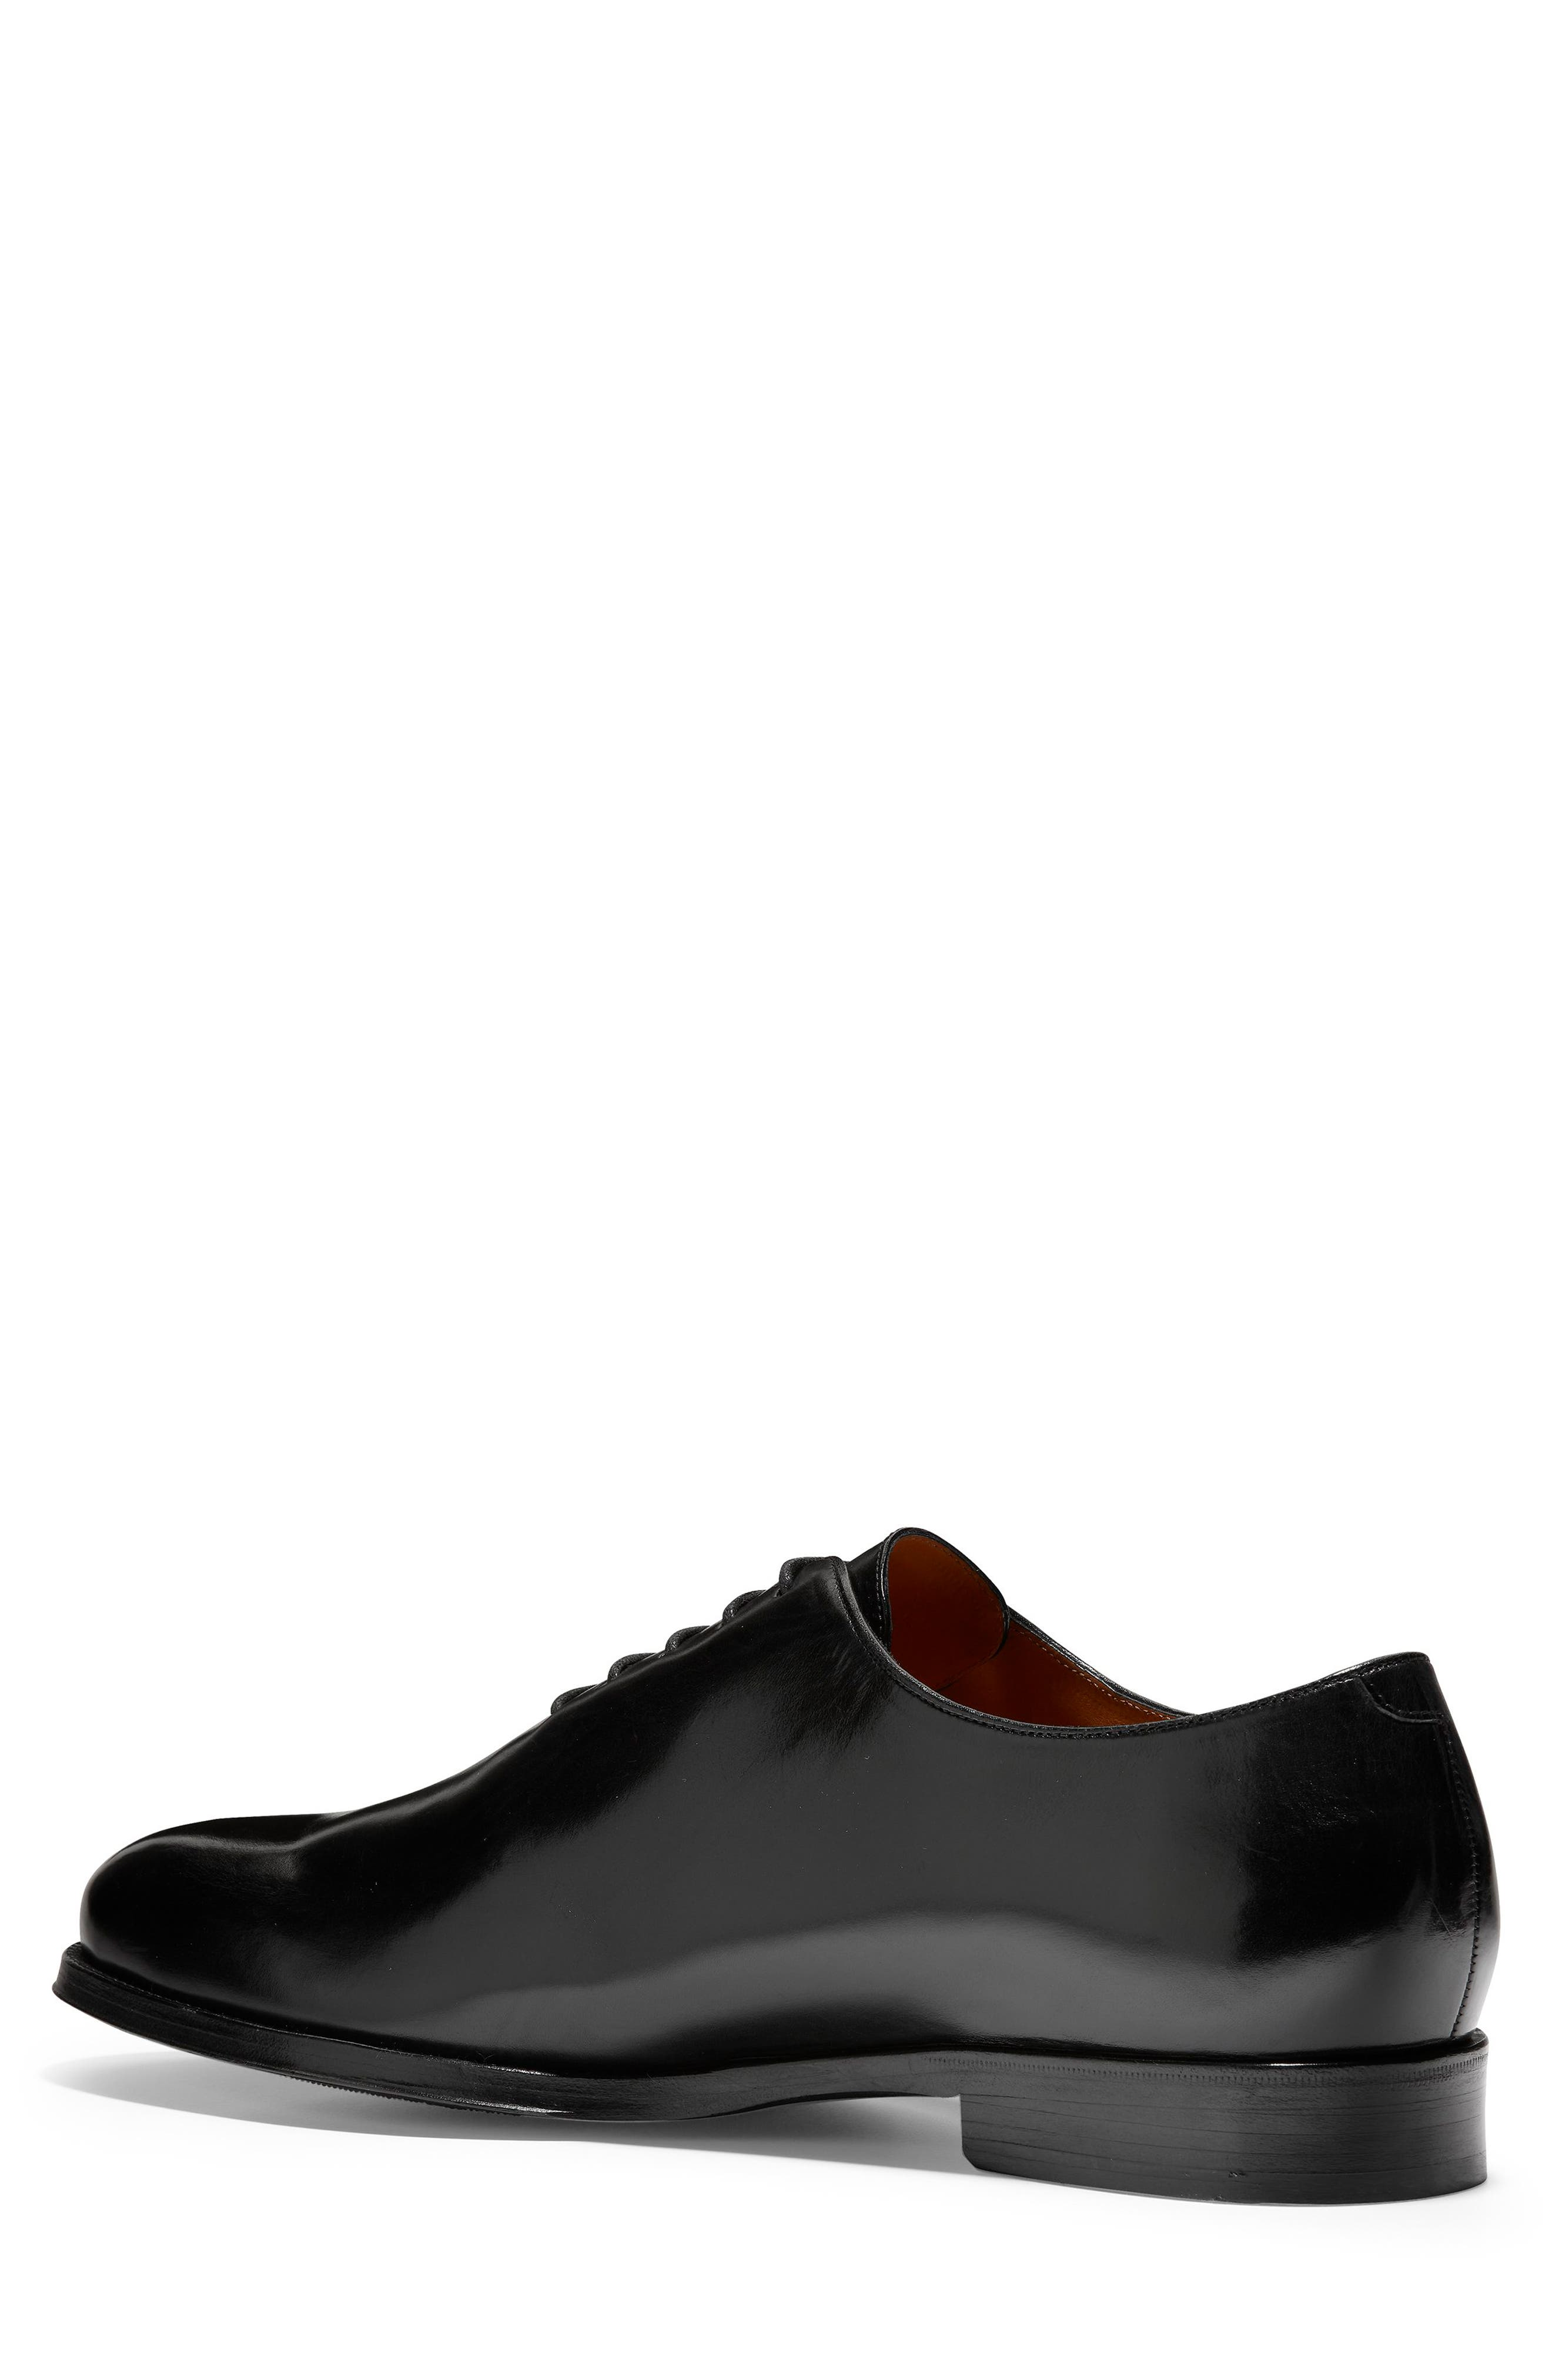 COLE HAAN, American Classics Gramercy Whole Cut Shoe, Alternate thumbnail 2, color, BLACK LEATHER